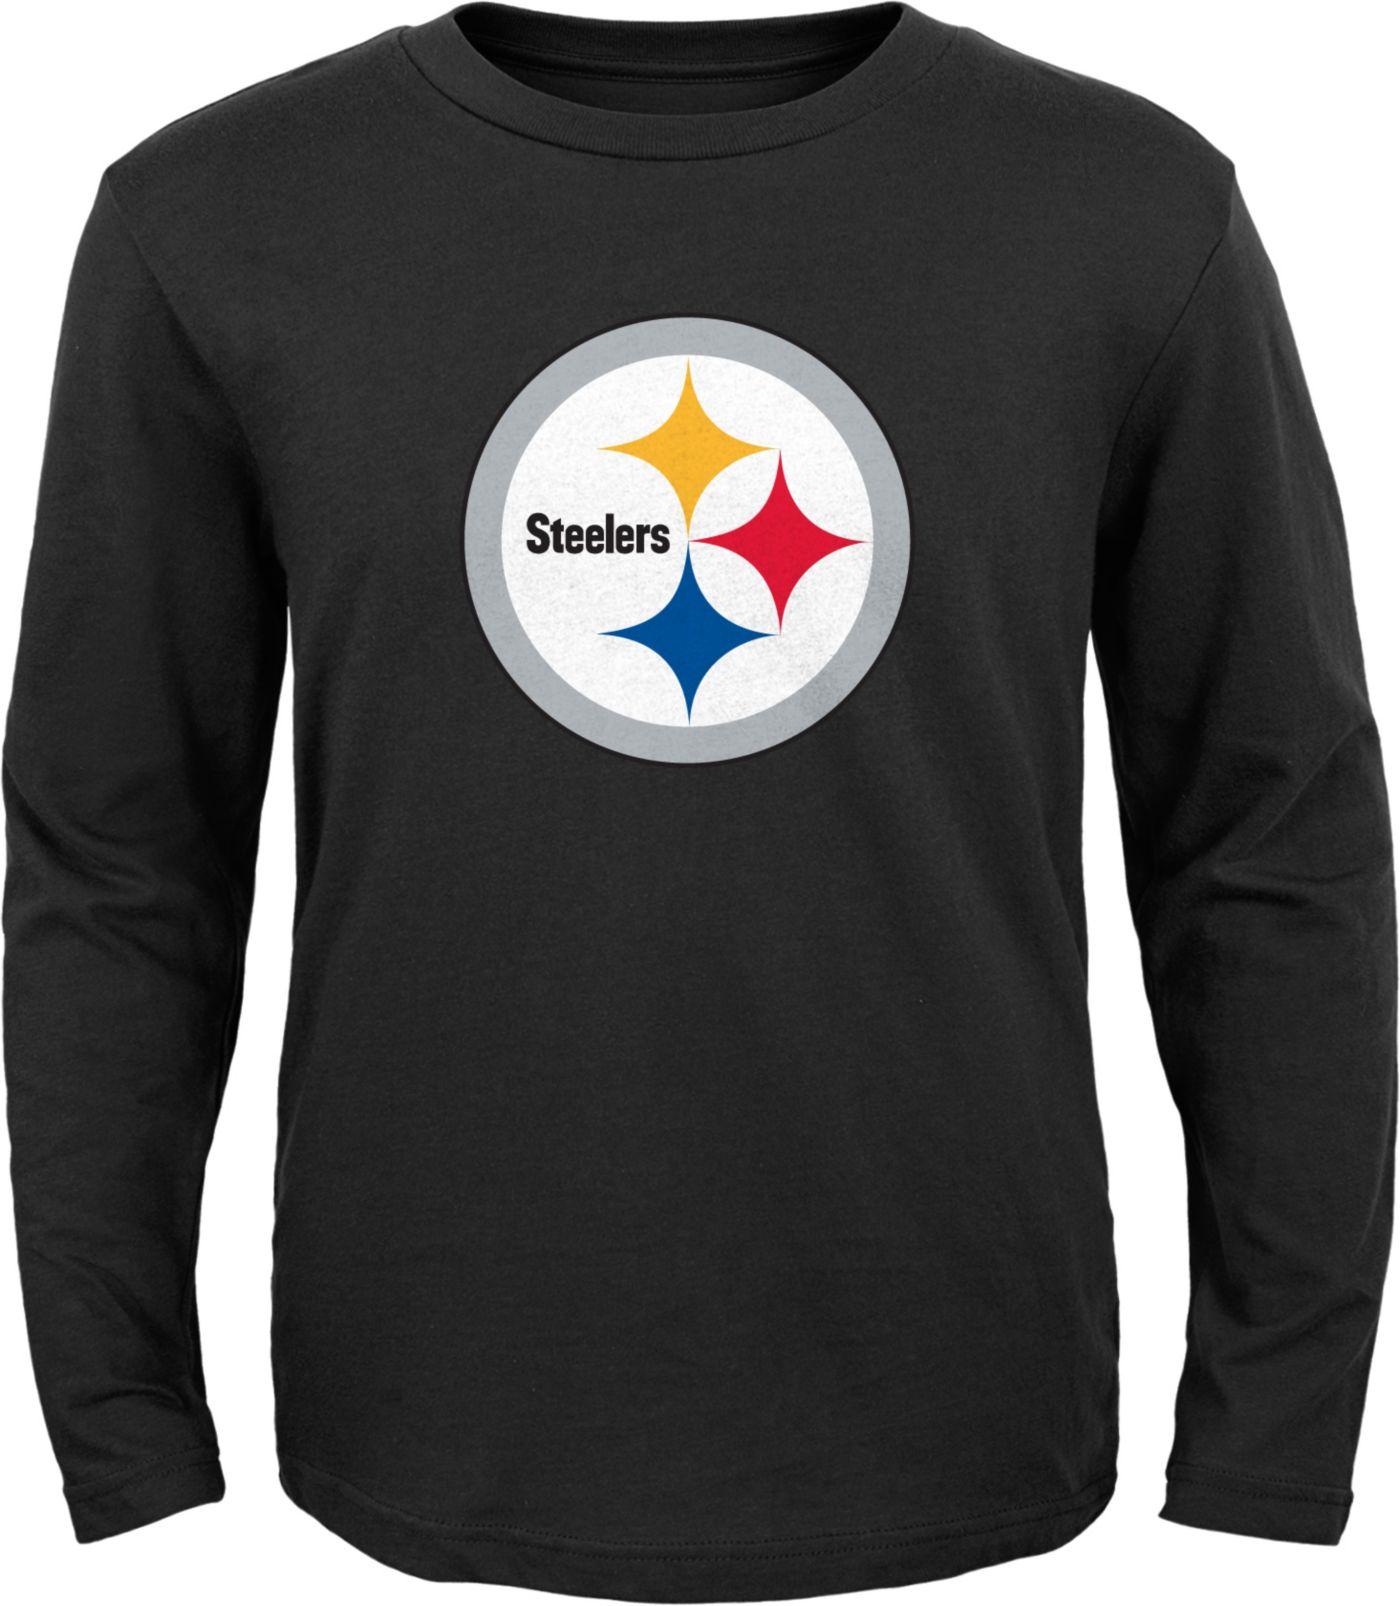 NFL Team Apparel Youth Pittsburgh Steelers Logo Black Long Sleeve Shirt